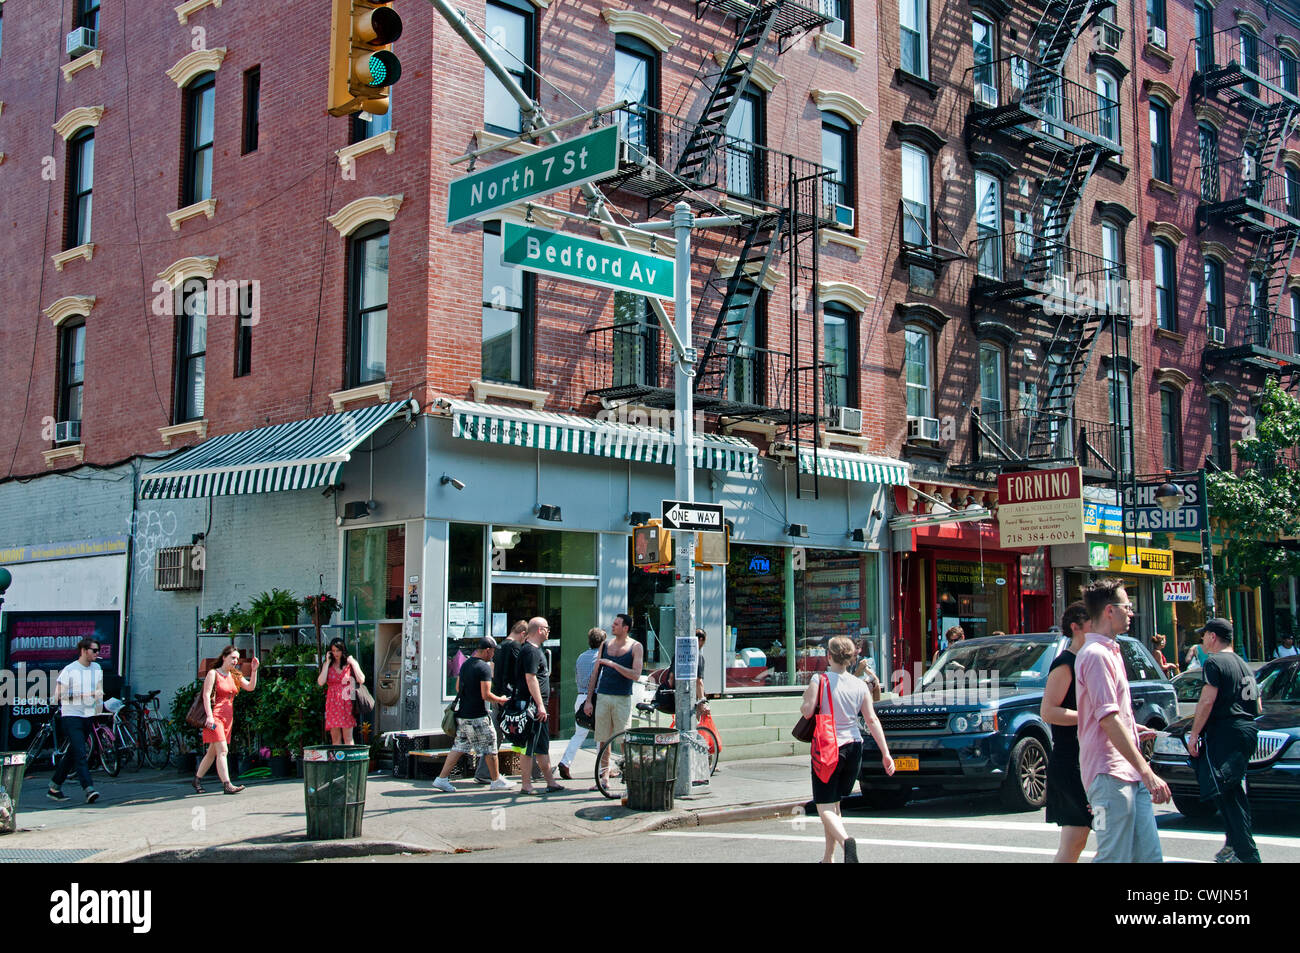 Bedford Avenue Williamsburg Brooklyn New York United States of America Photo Stock